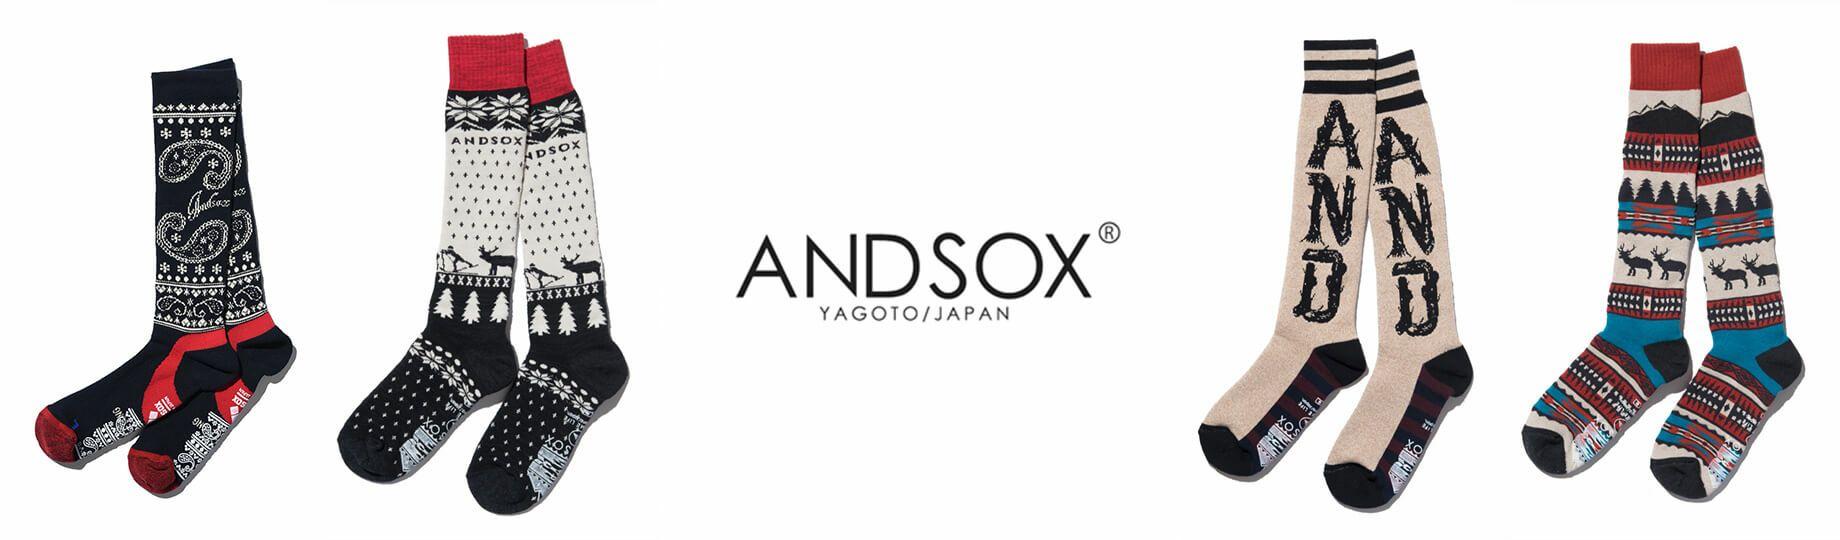 ANDSOXメイン画像